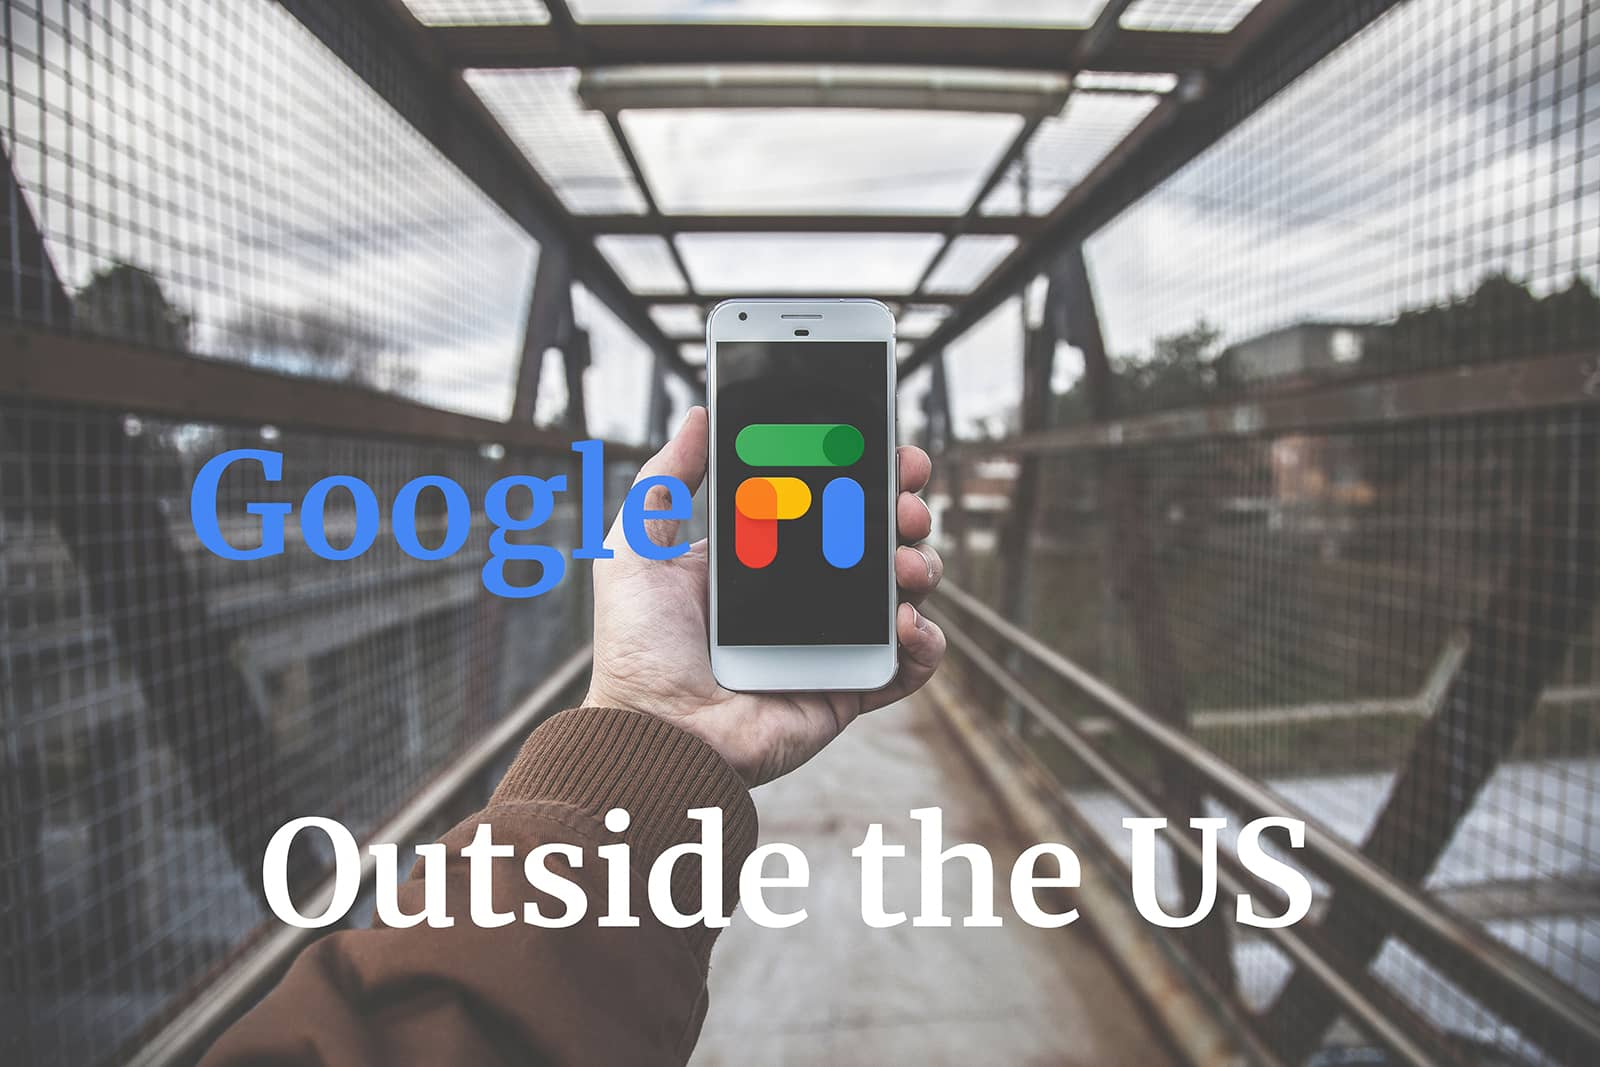 comment activer google fi en dehors des usa 1600px 1 | graydonschwartz.com